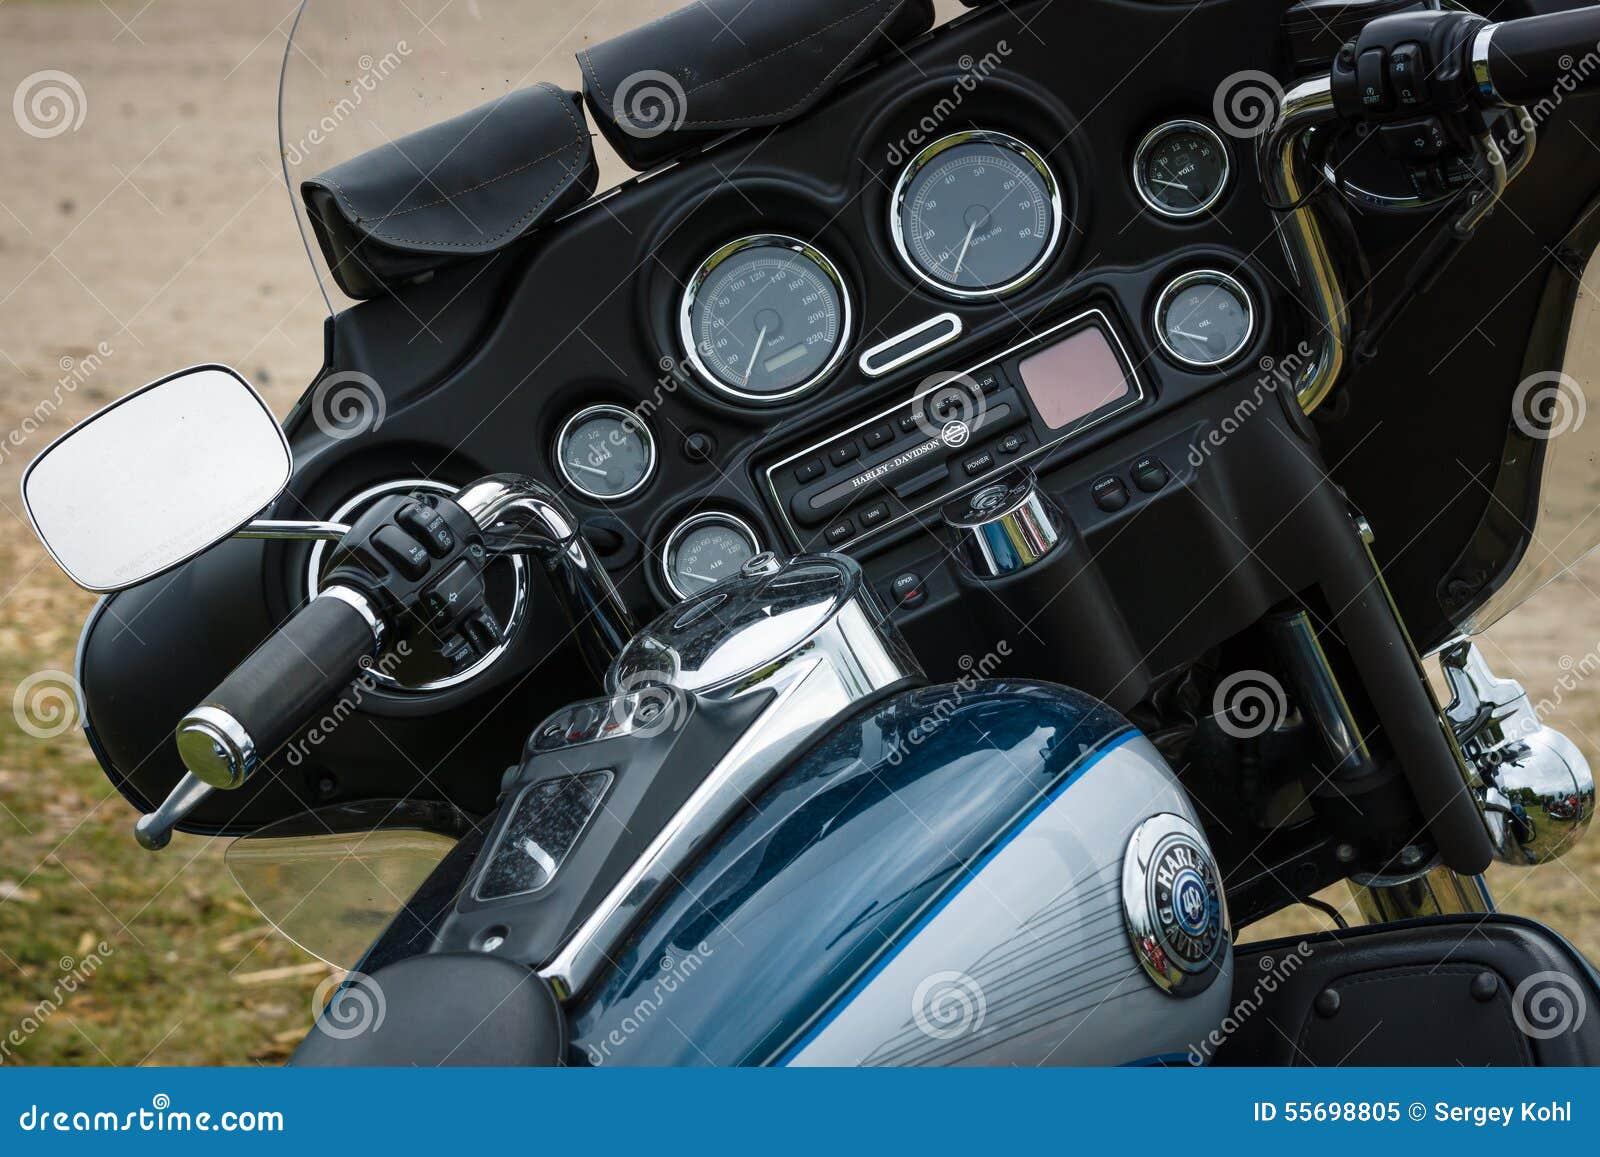 tableau de bord d 39 une moto harley davidson electra glide ultra classic image ditorial image. Black Bedroom Furniture Sets. Home Design Ideas